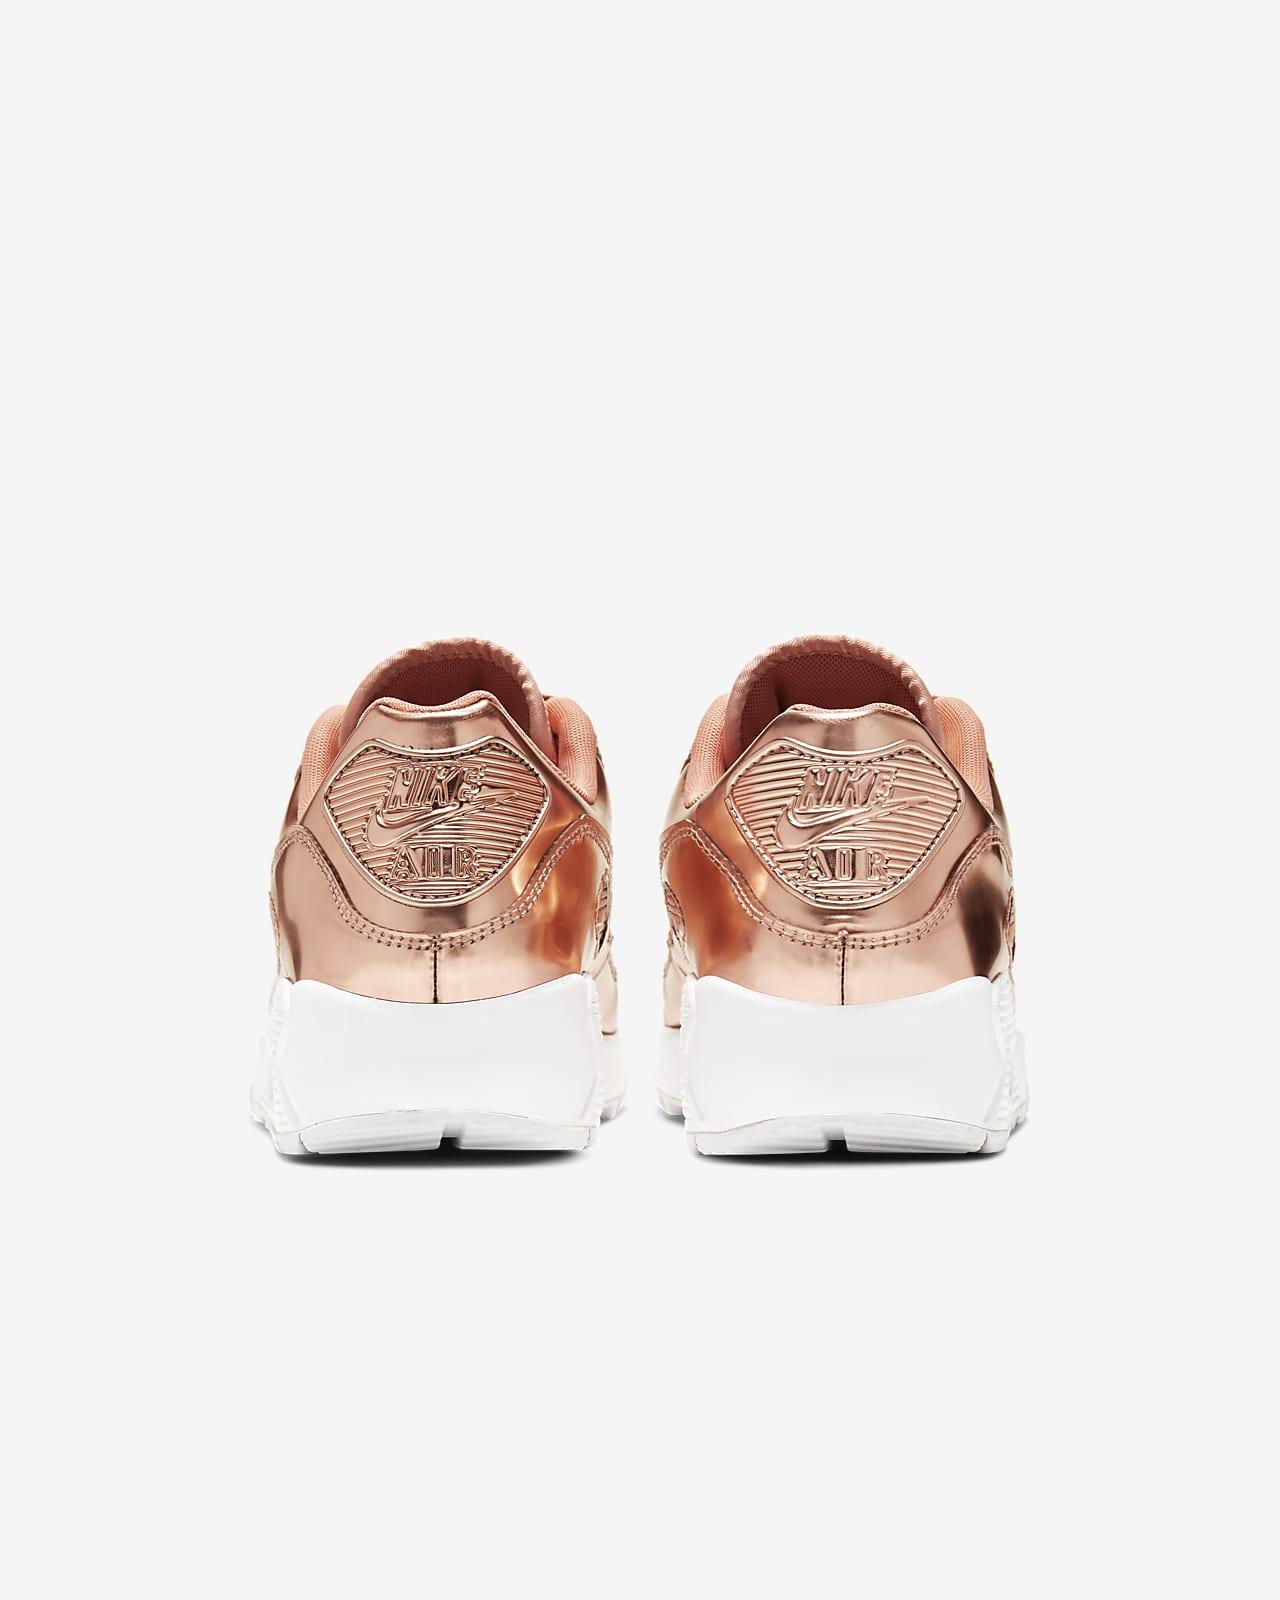 Nike Air Max 90 SP Shoe